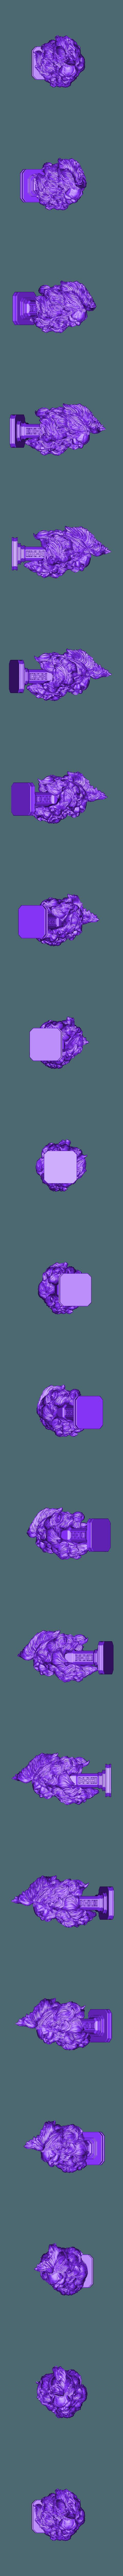 BeardedYell_Highest_2804k.stl Download free STL file The Bearded Yell • 3D printable object, bendansie